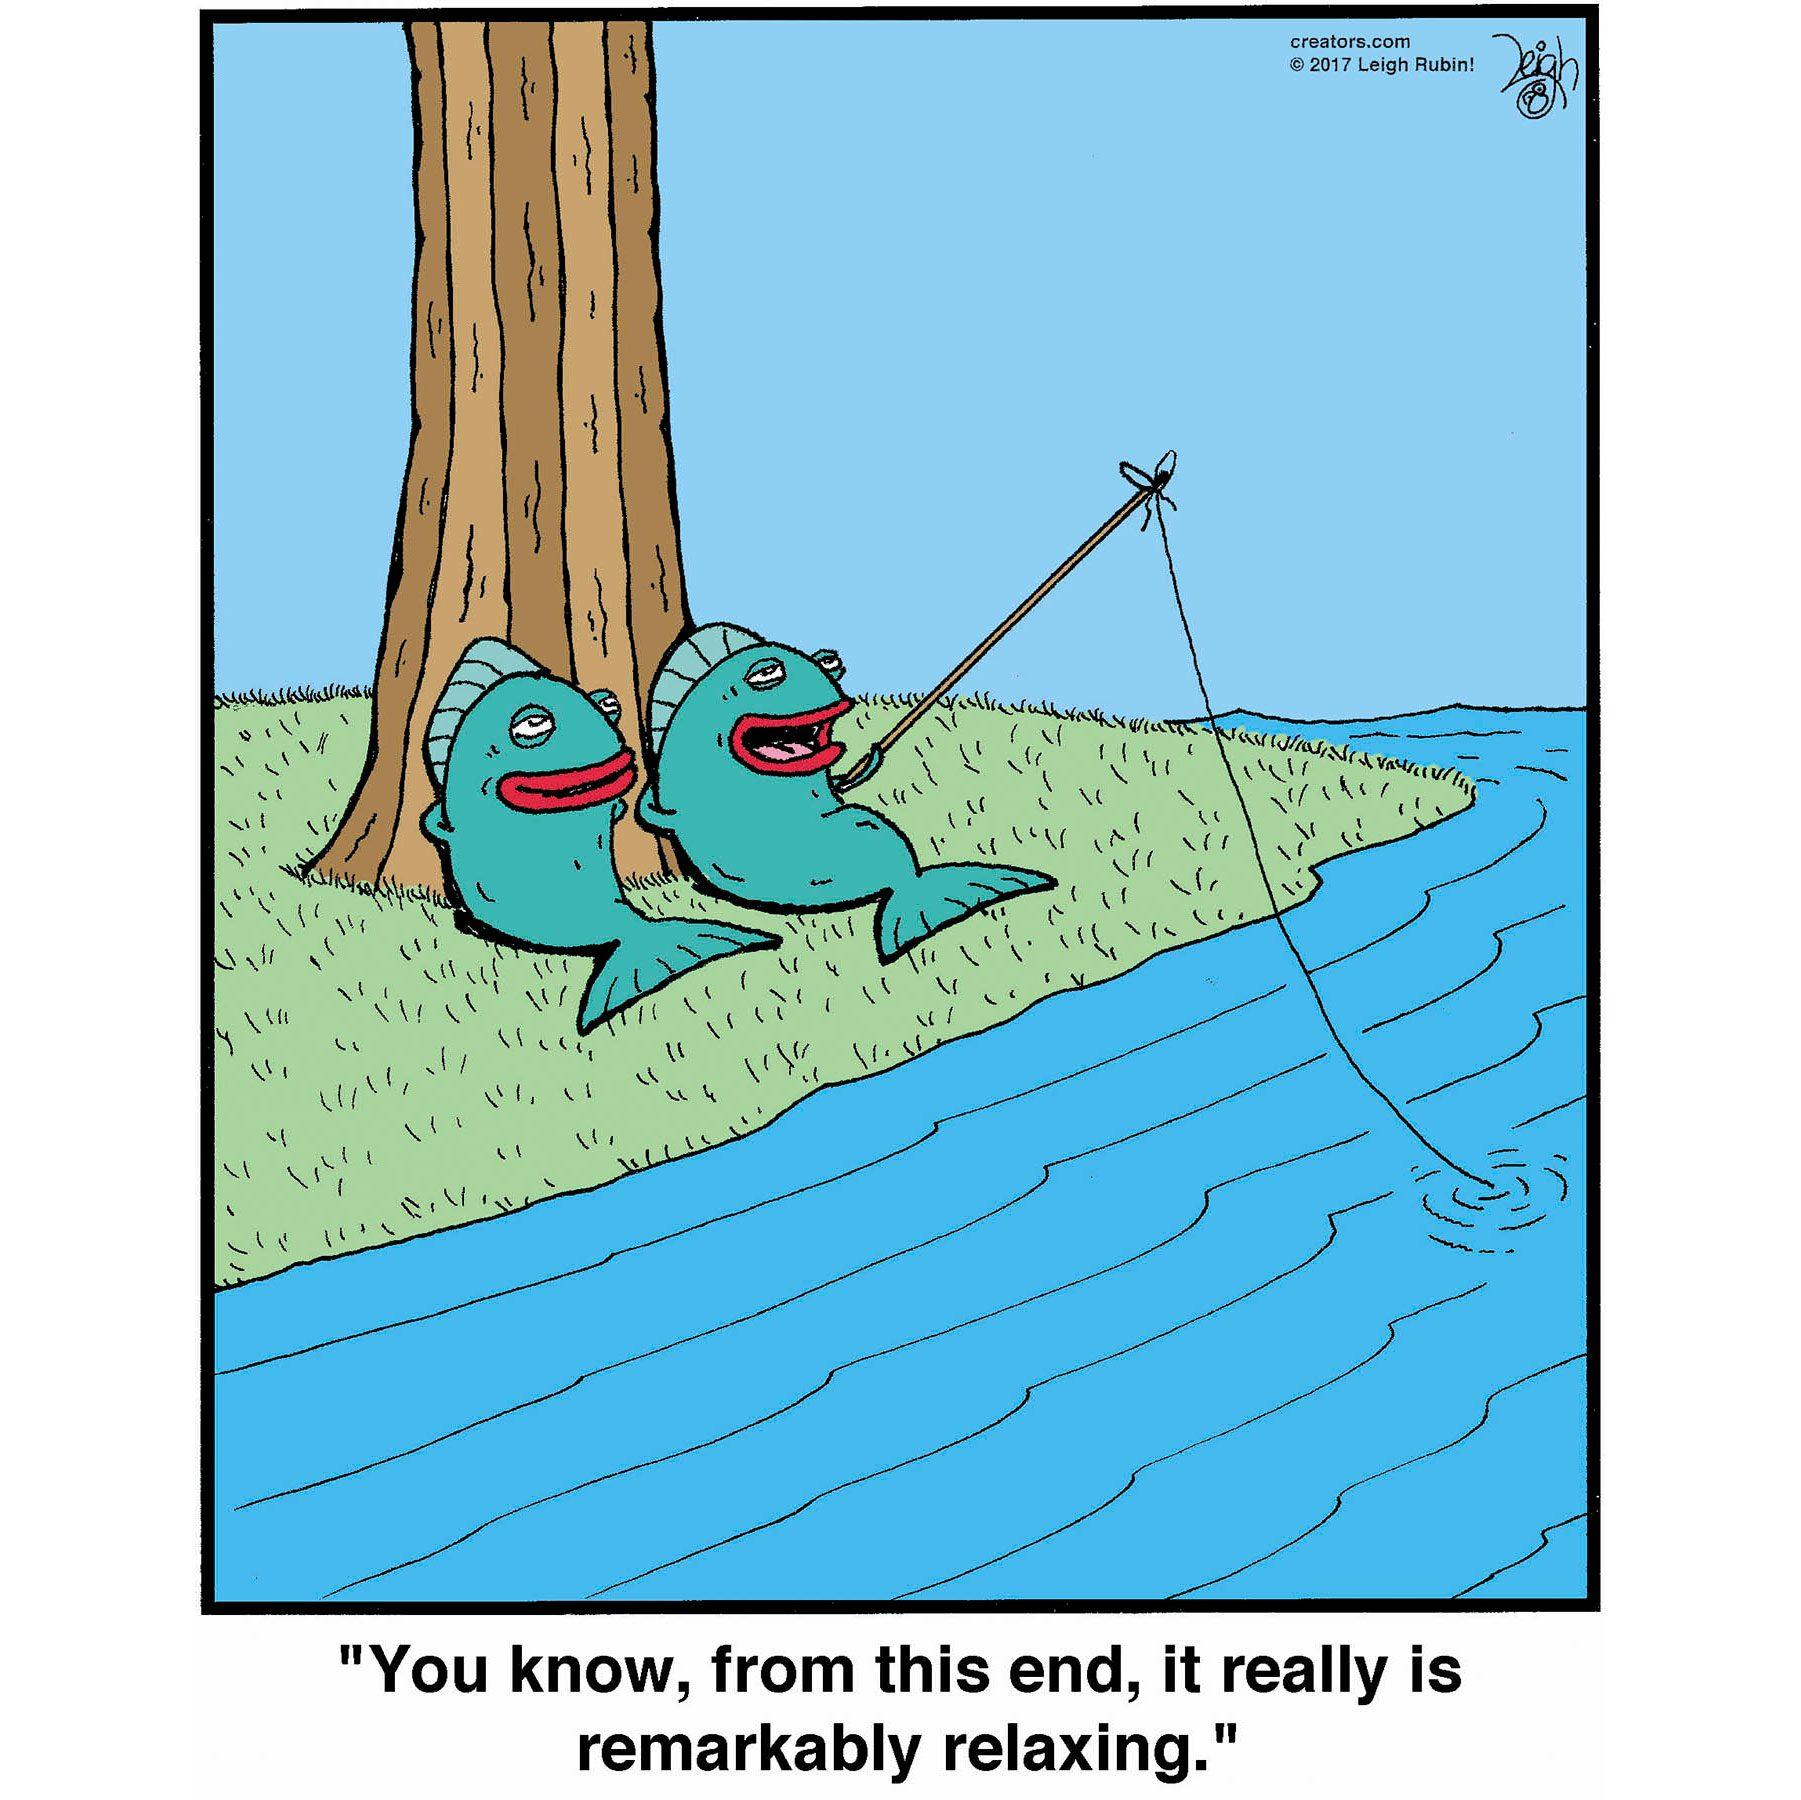 fish fishing cartoon by Leigh Rubin